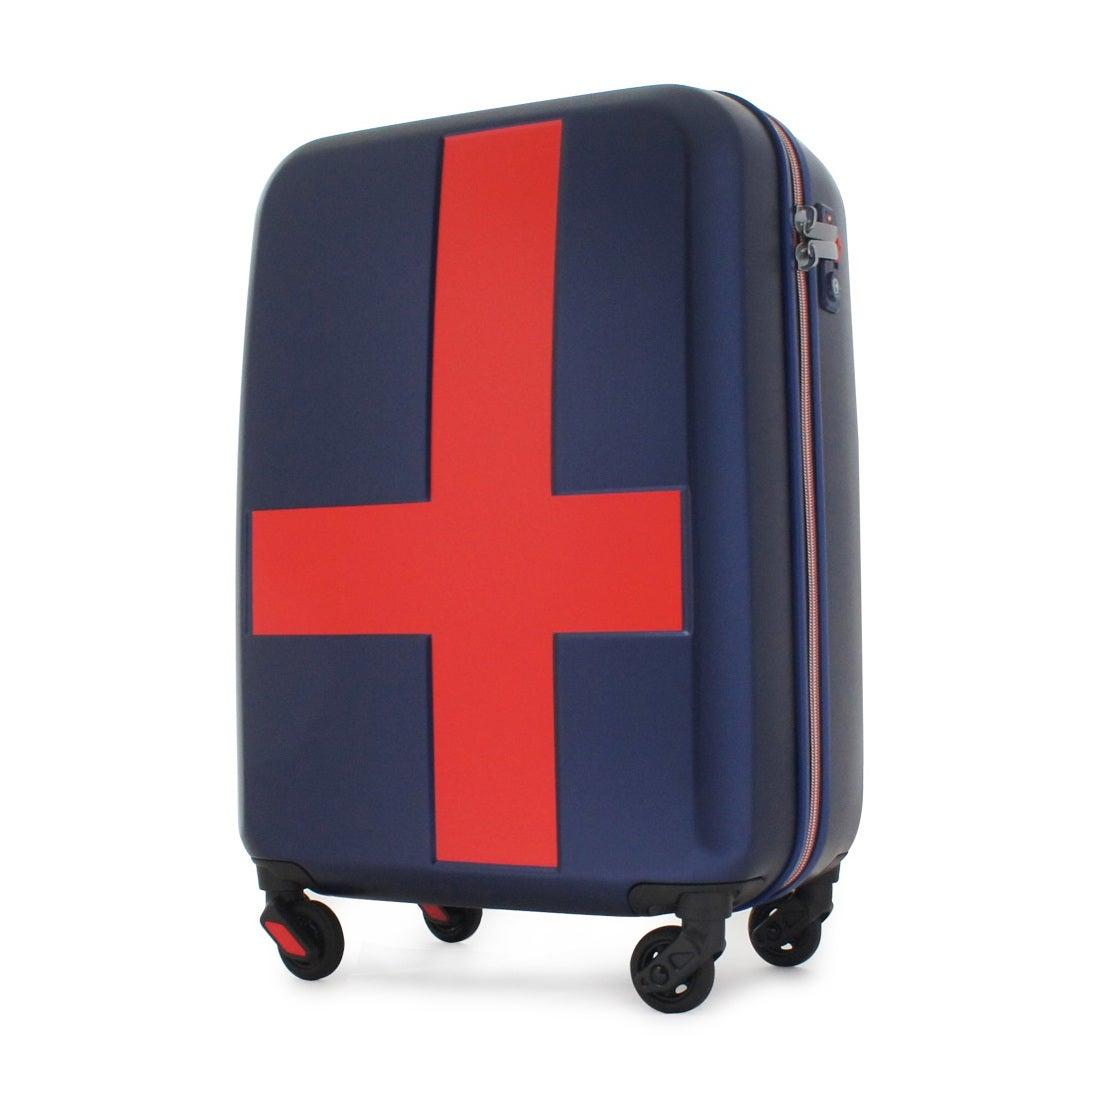 【SAC'S BAR】イノベーター スーツケース INV48/48T 48cm 【INV48T】NAVY/RED メンズ